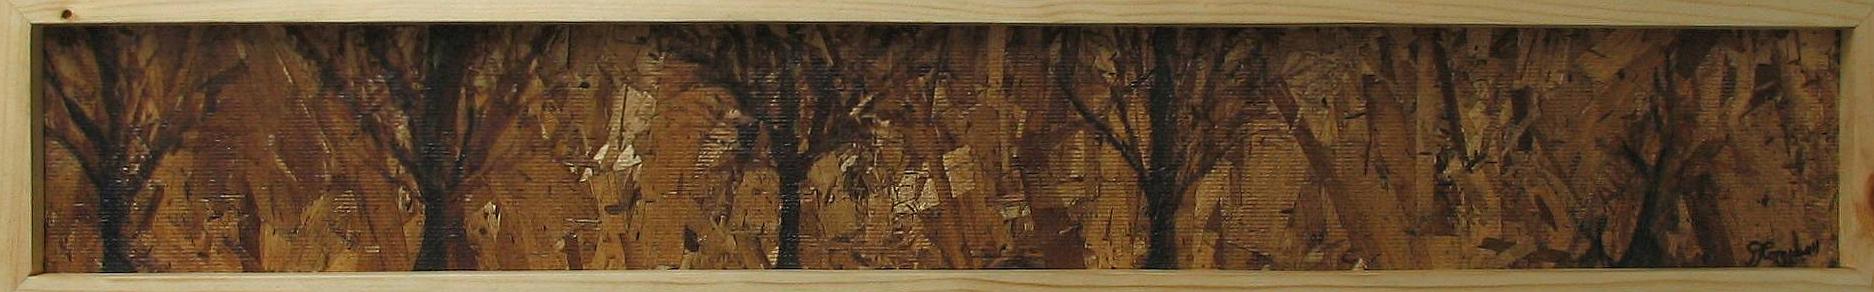 woodfortreessm2